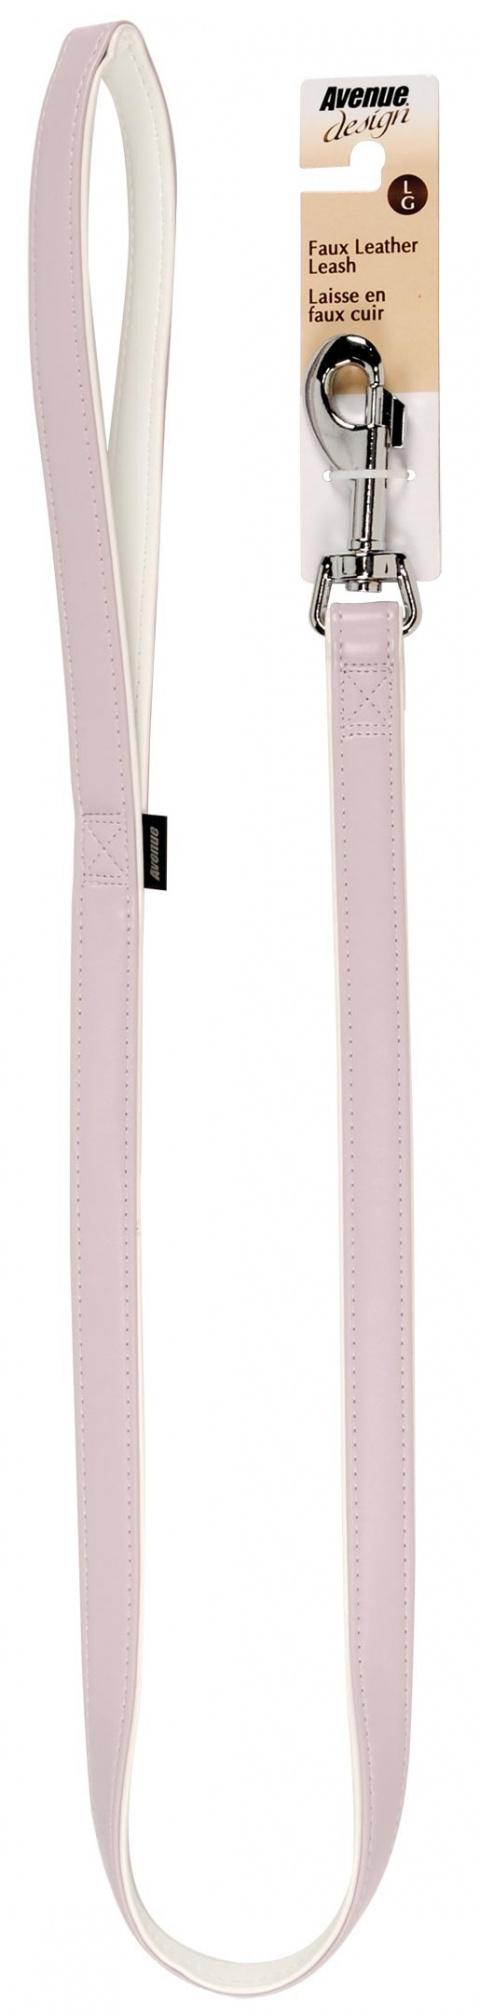 Vodítko AVENUE Elegance růžové 100 x 2 cm